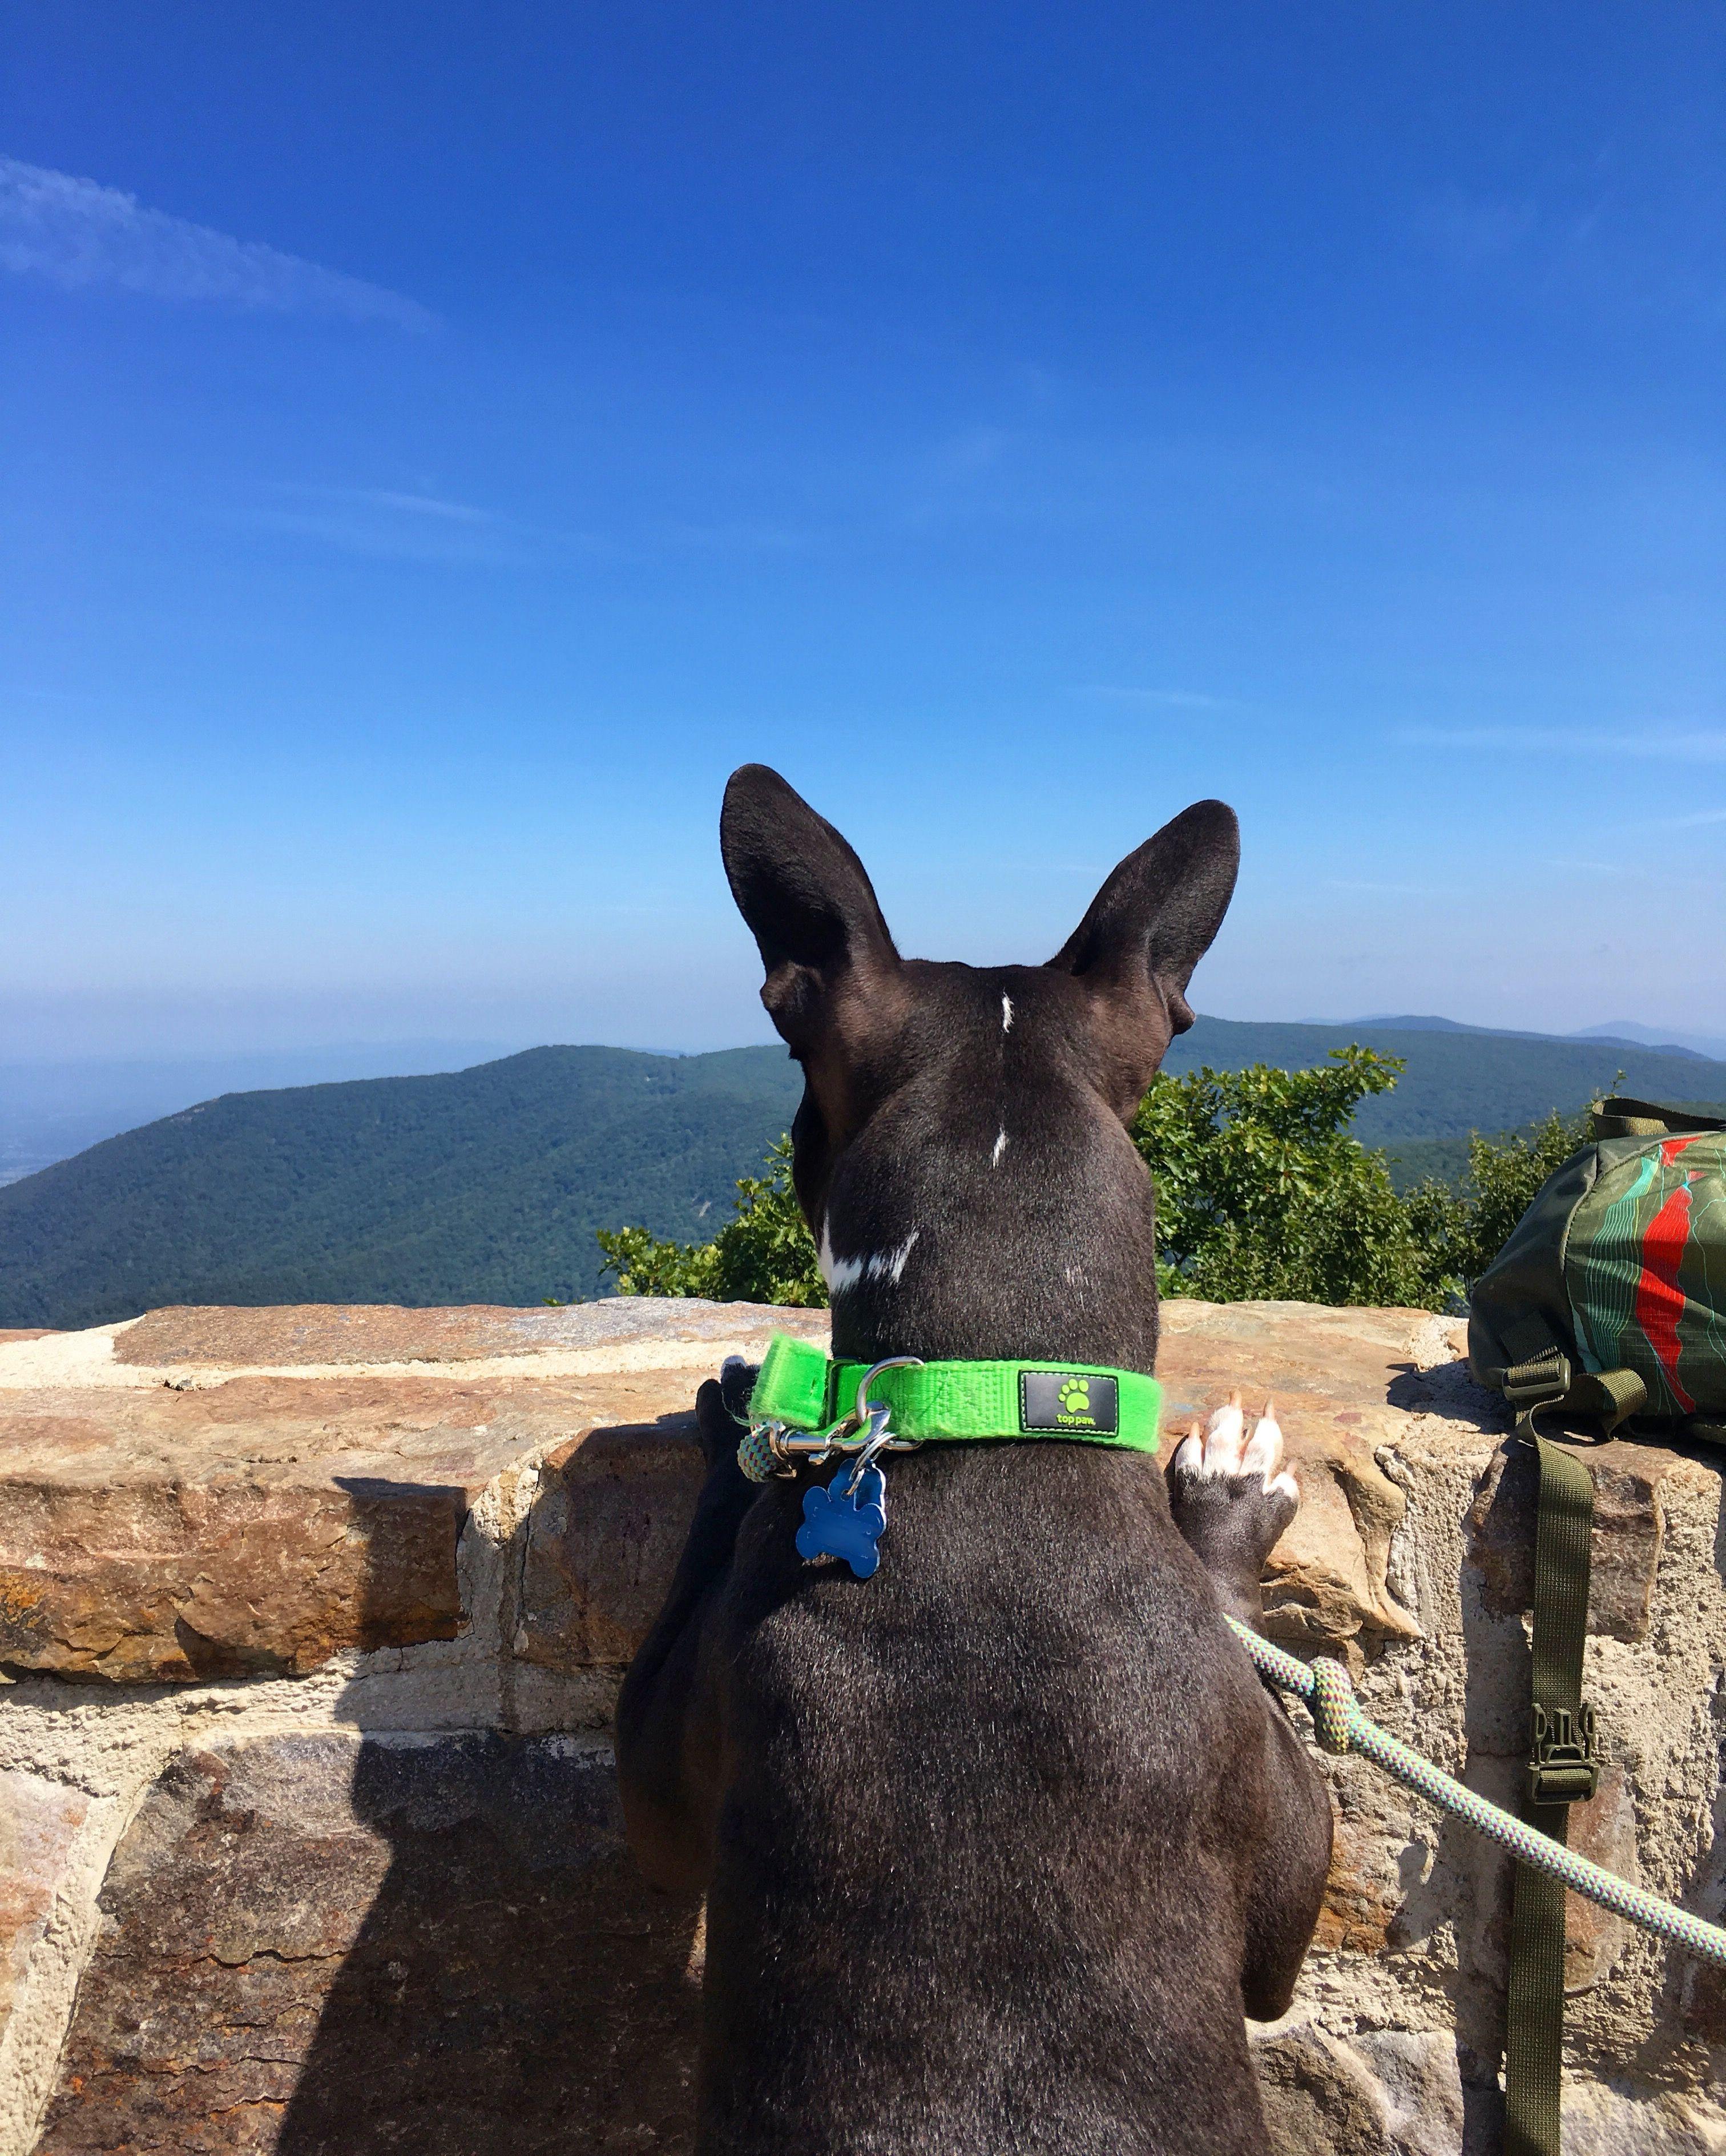 Hawksbill Mountain Shenandoah National Park Appalachian Trail